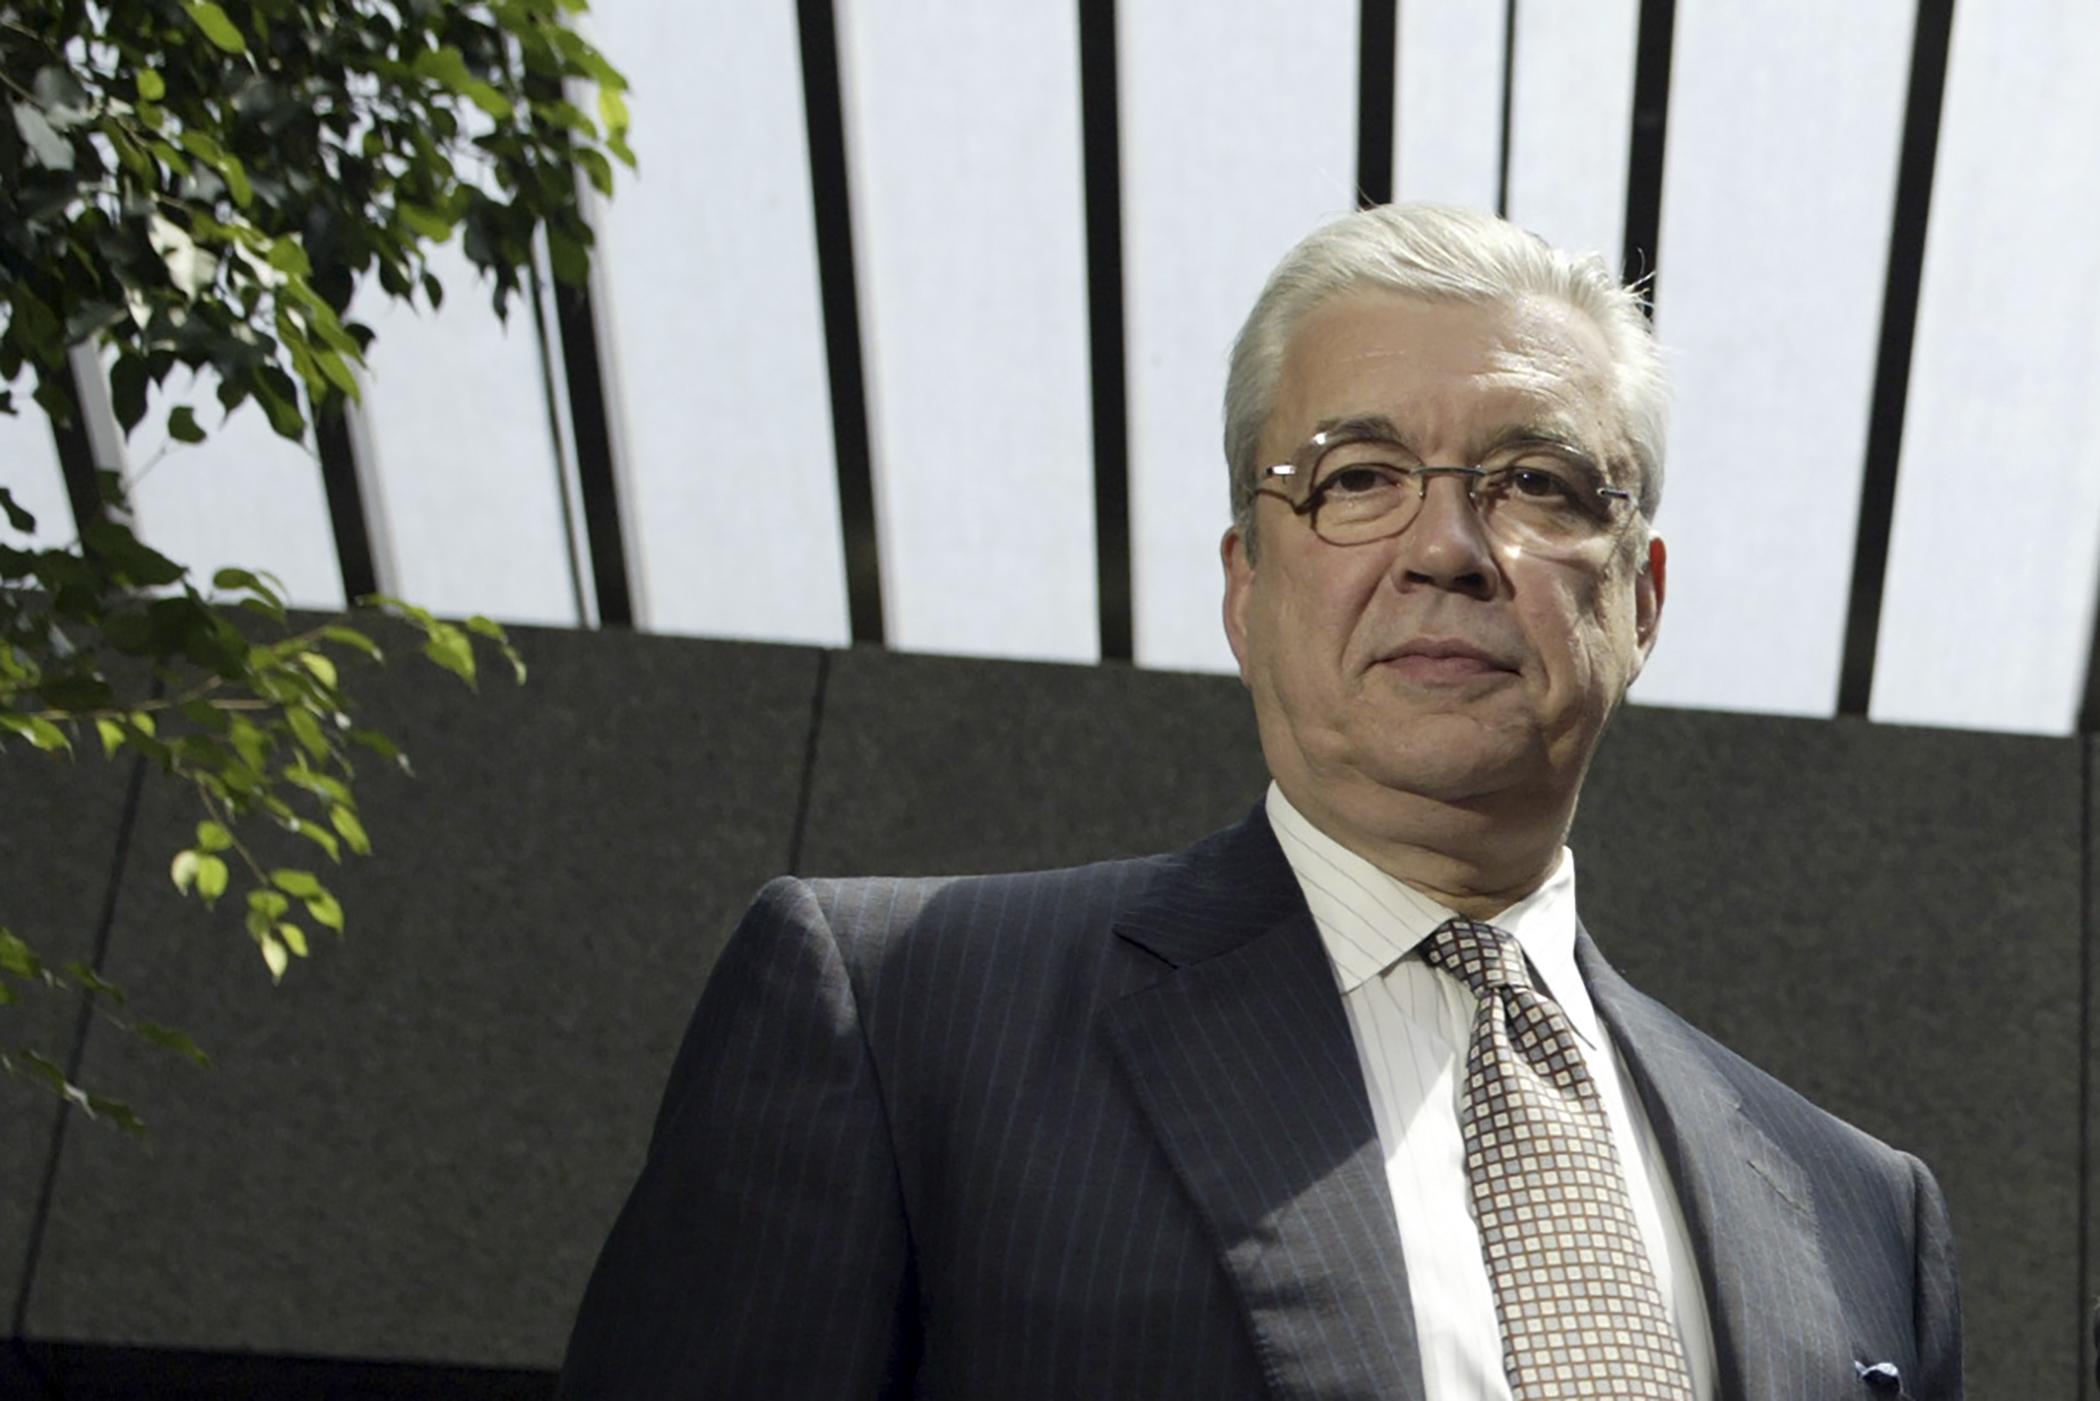 United Health Group CEO William McGuire, MD, at the LA Times building in LA.